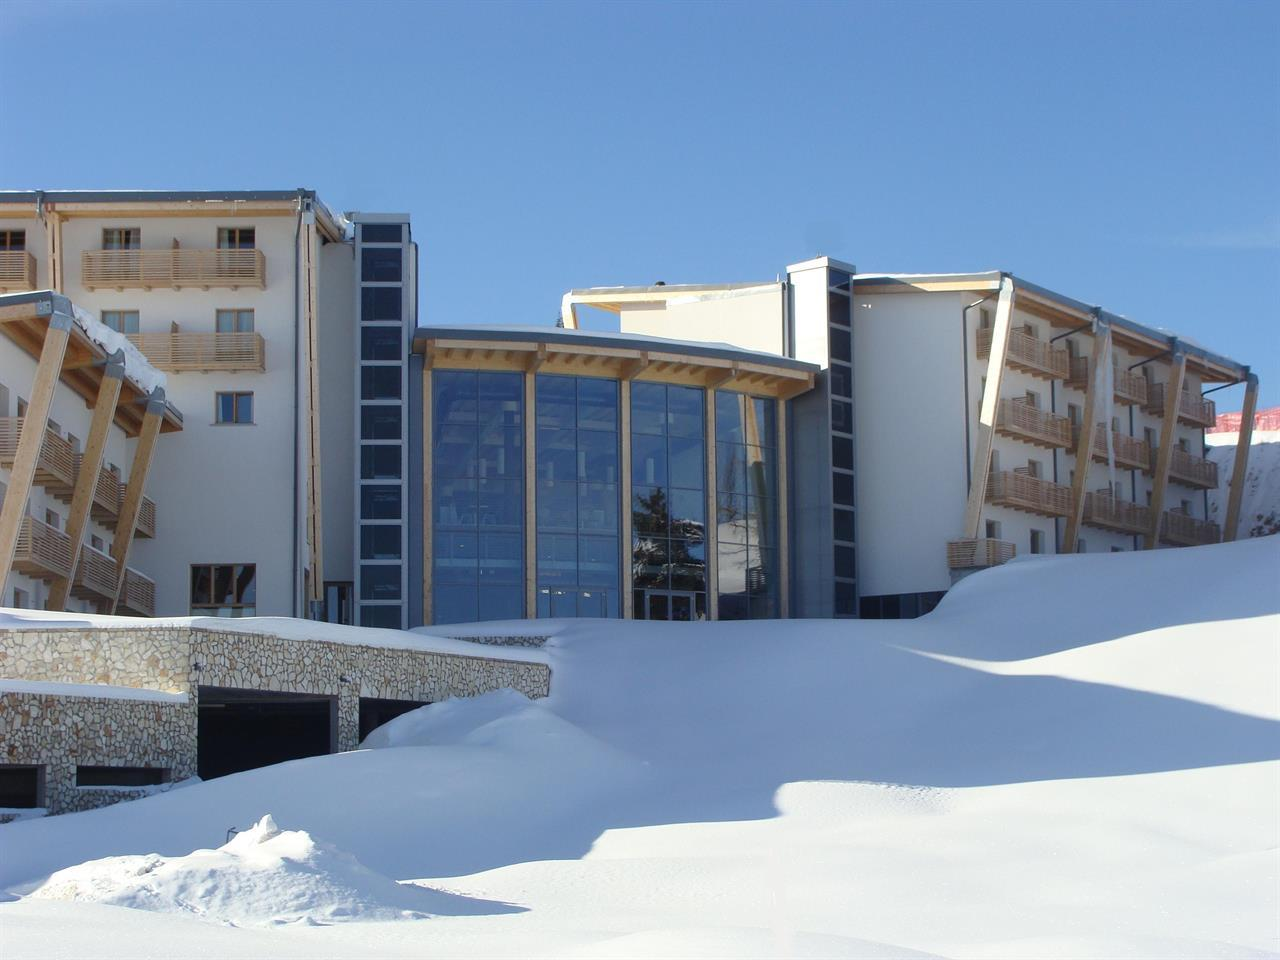 le blanc hotel spa hotel in monte bondone trentino italy. Black Bedroom Furniture Sets. Home Design Ideas